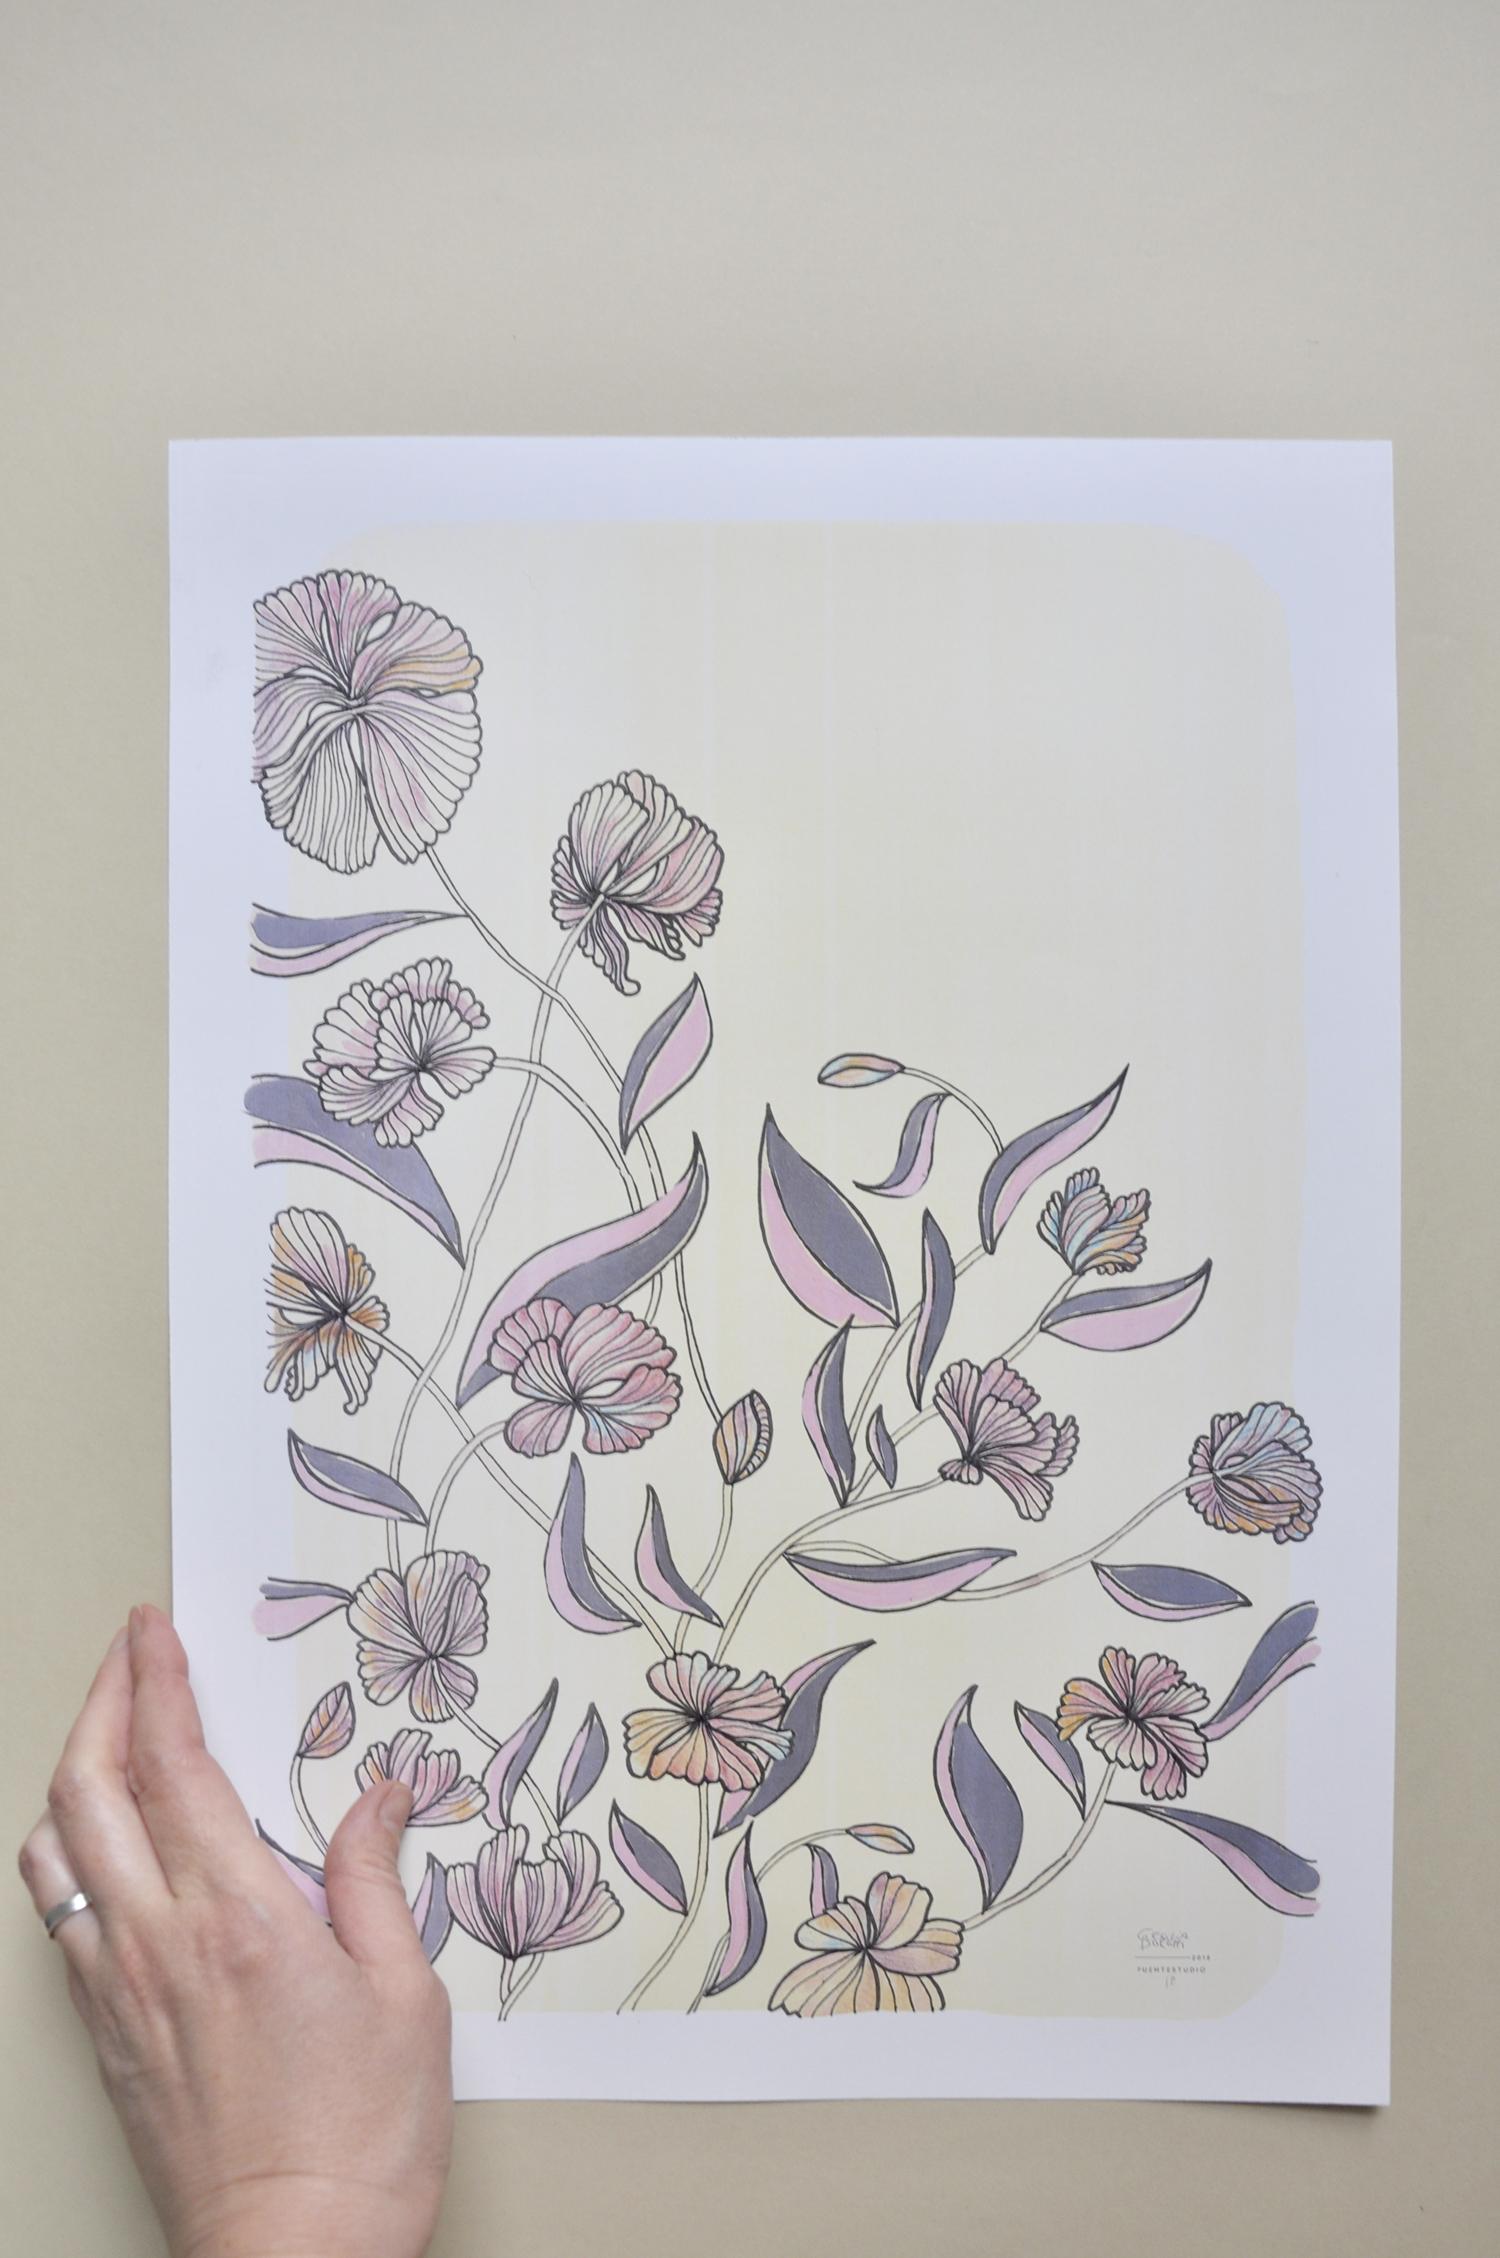 ceciliaborghi_puentestudio_magnolia2.jpg